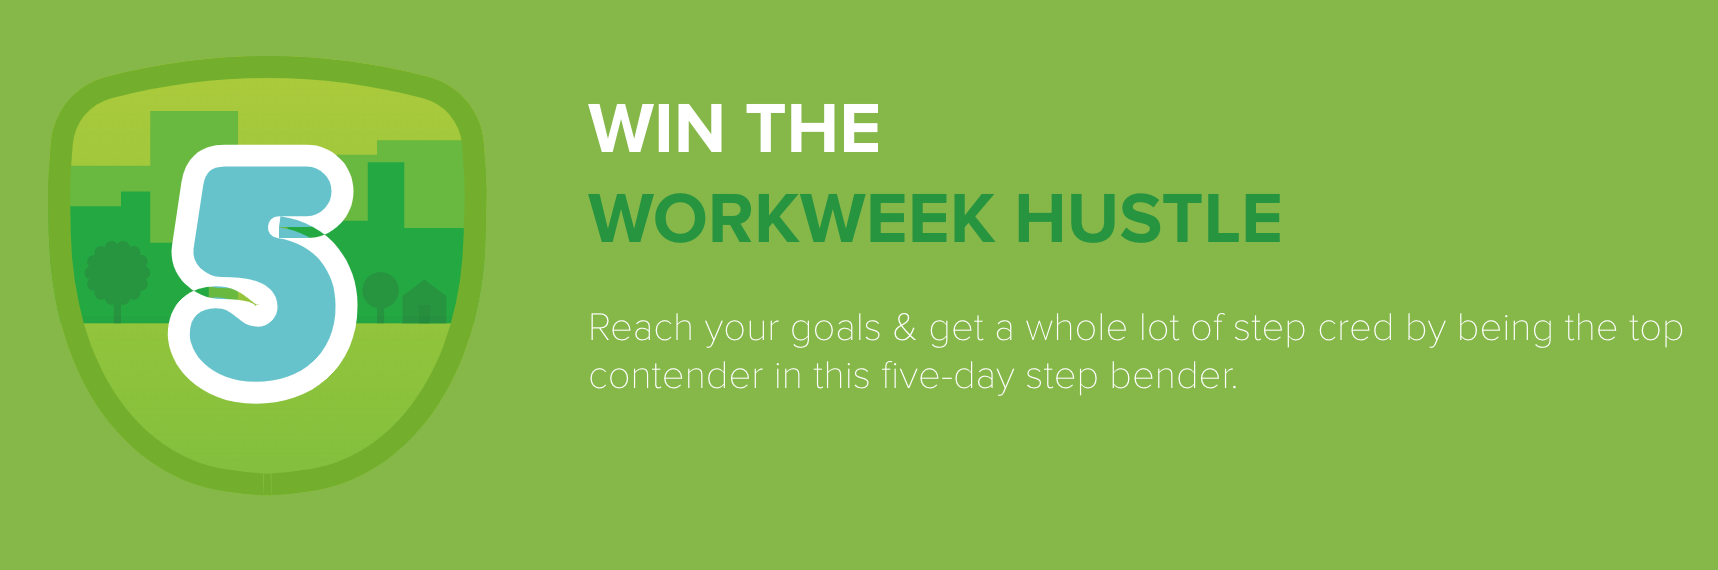 FitBit workweek hustle challenge for insurance agencies